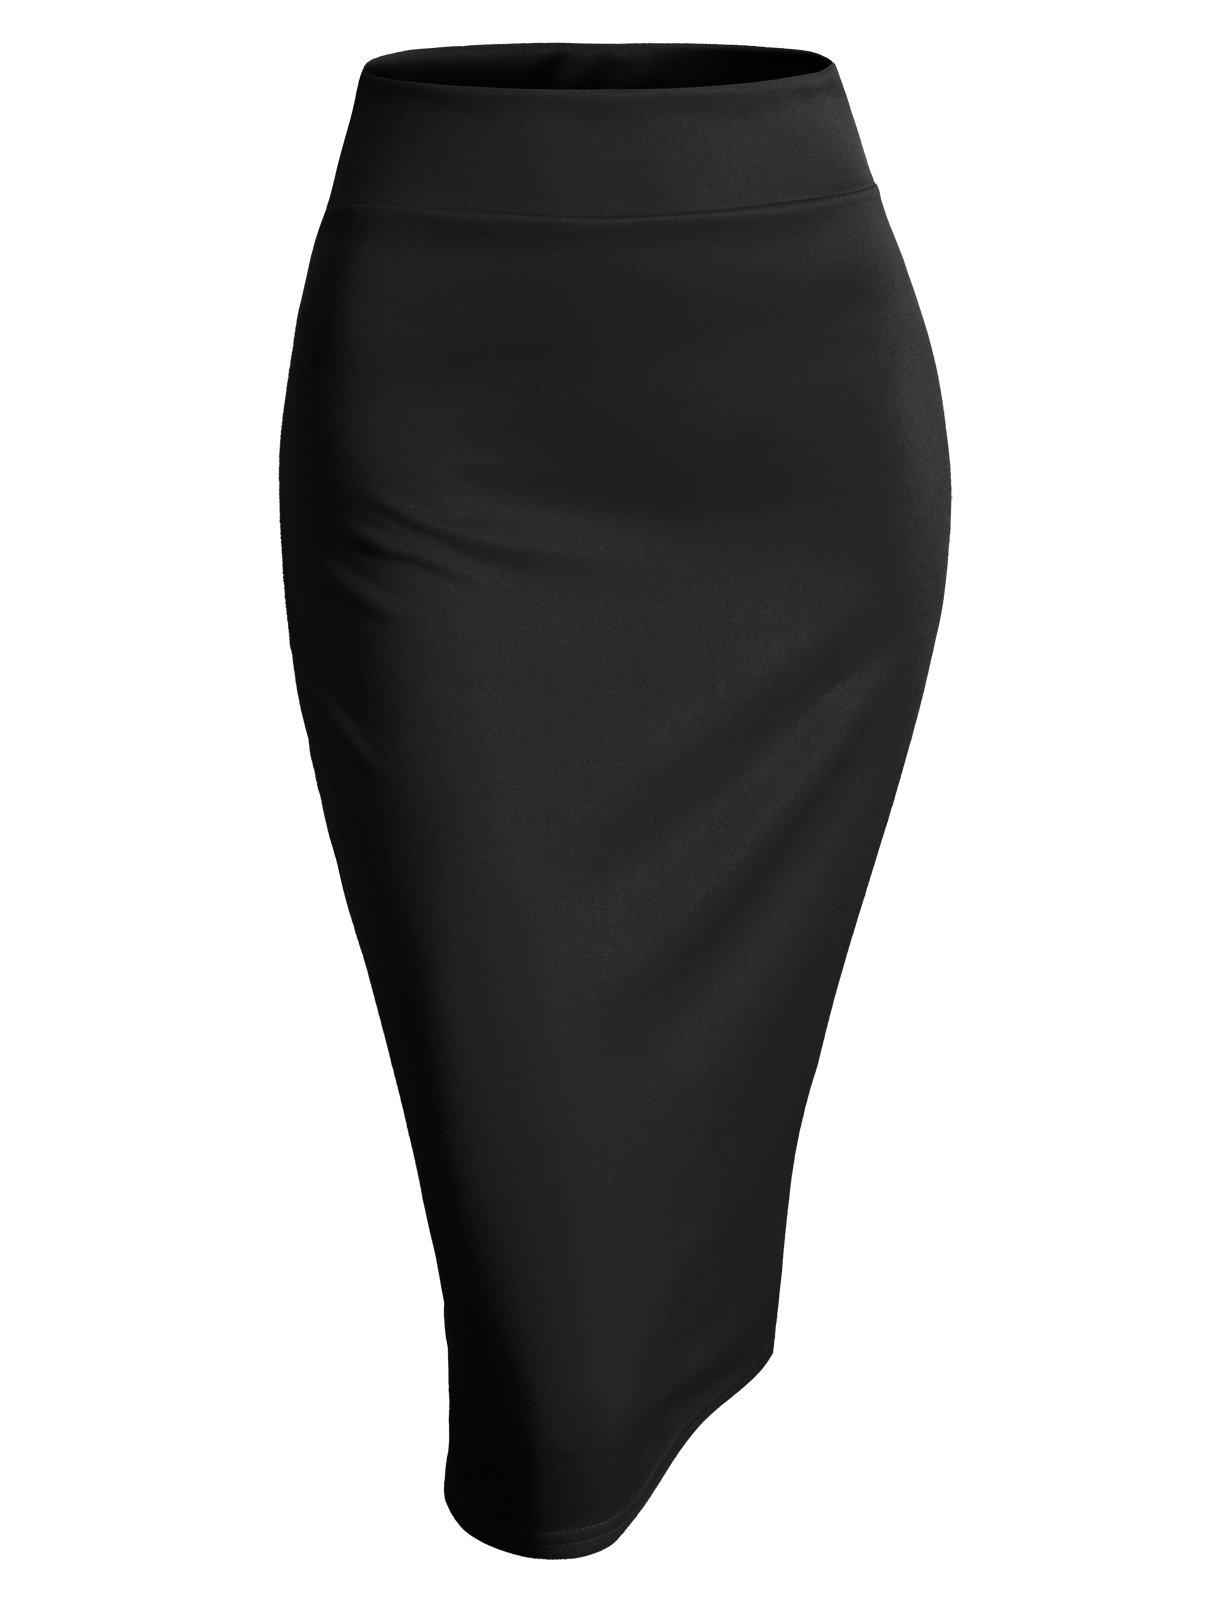 H2H Womens Basic Versatile Elastic Waist Band Office Pencil Skirt Black XL (AWBMS0189)